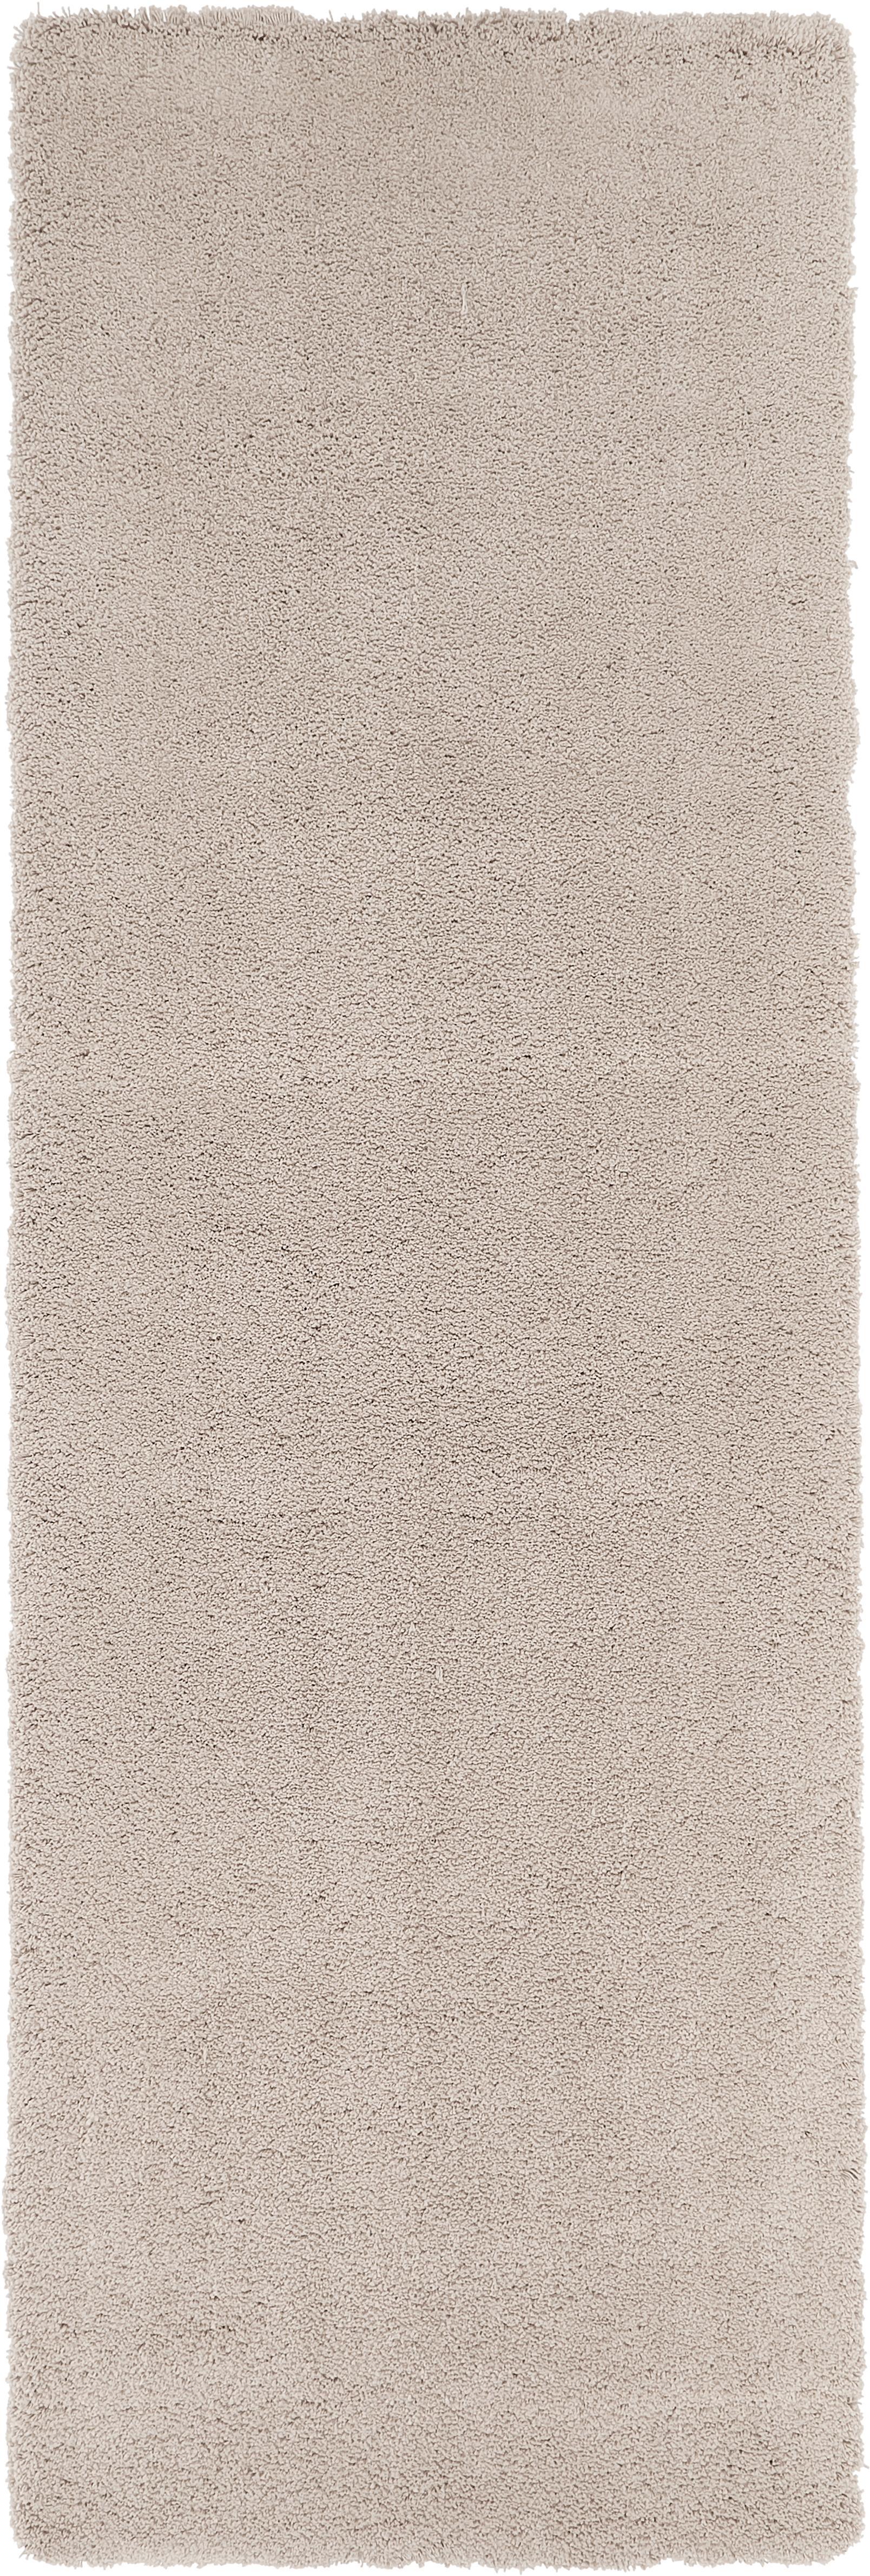 Alfombra de pelo largo Leighton, Parte superior: 100%poliéster (microfibr, Reverso: 70%poliéster, 30%algodó, Beige, An 80 x L 250 cm